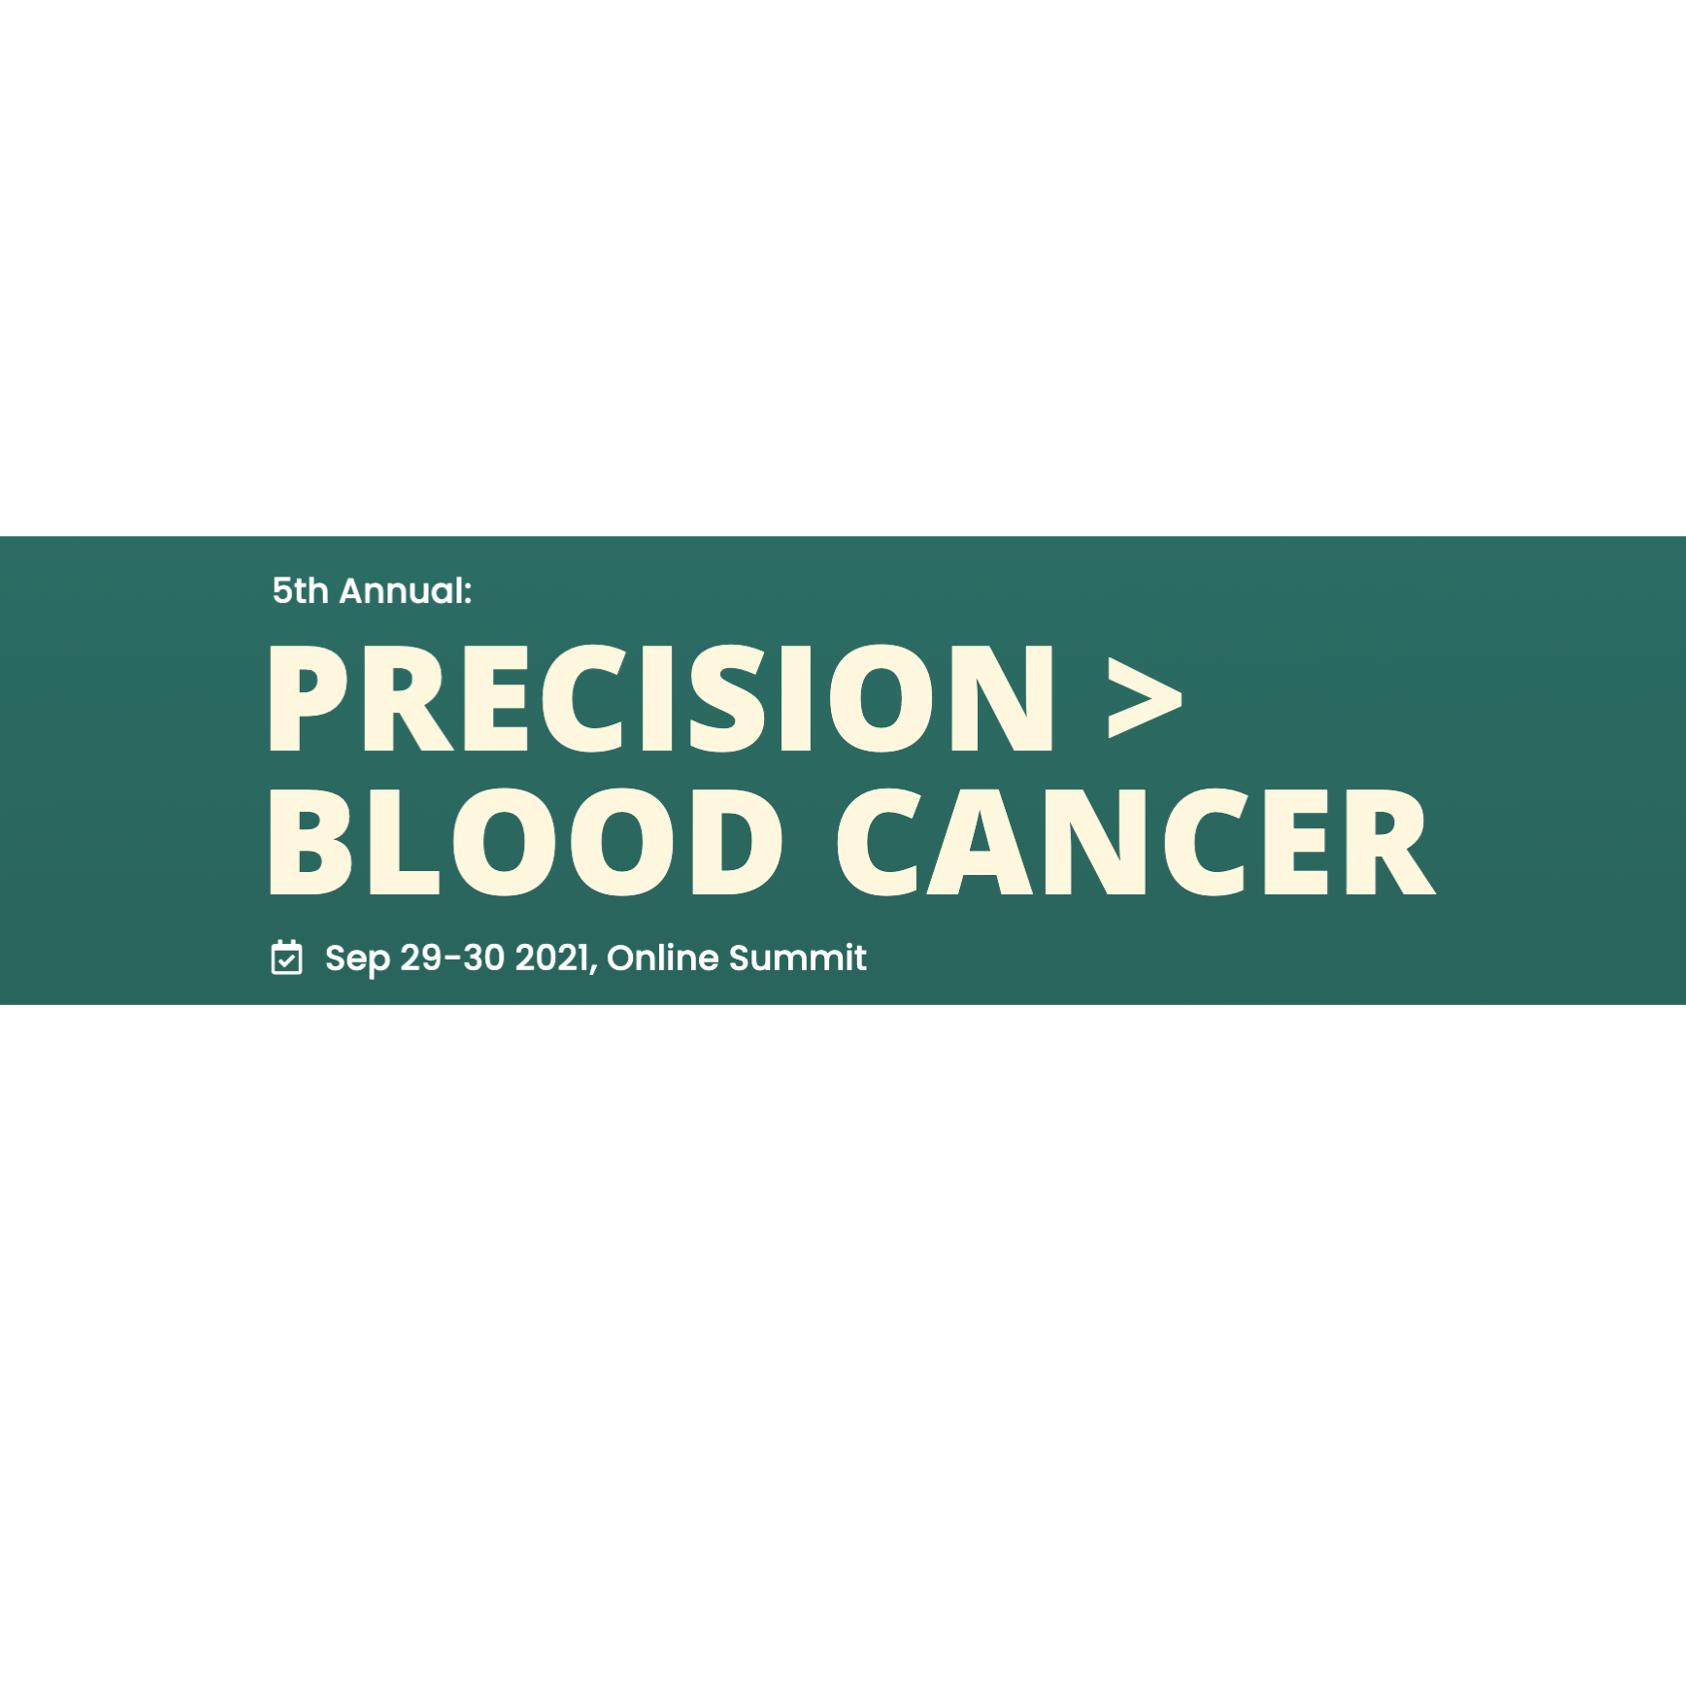 Precision Blood Cancer Summit 2021